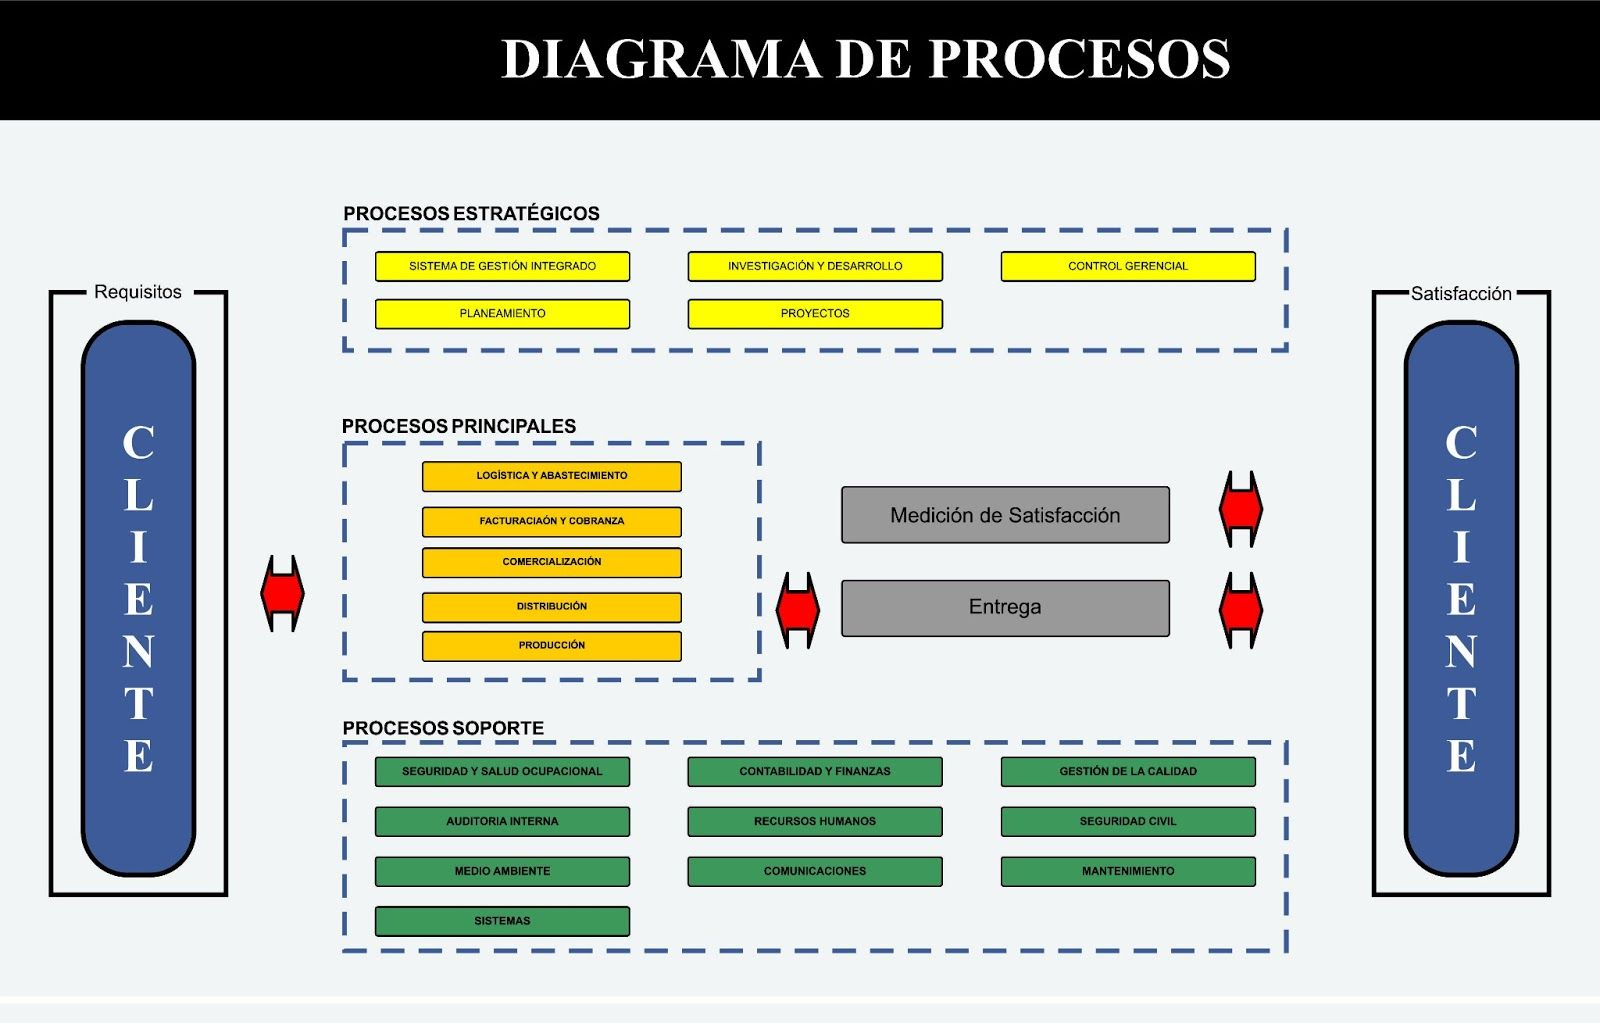 Diagrama+de+procesos.jpg (1600×1023)